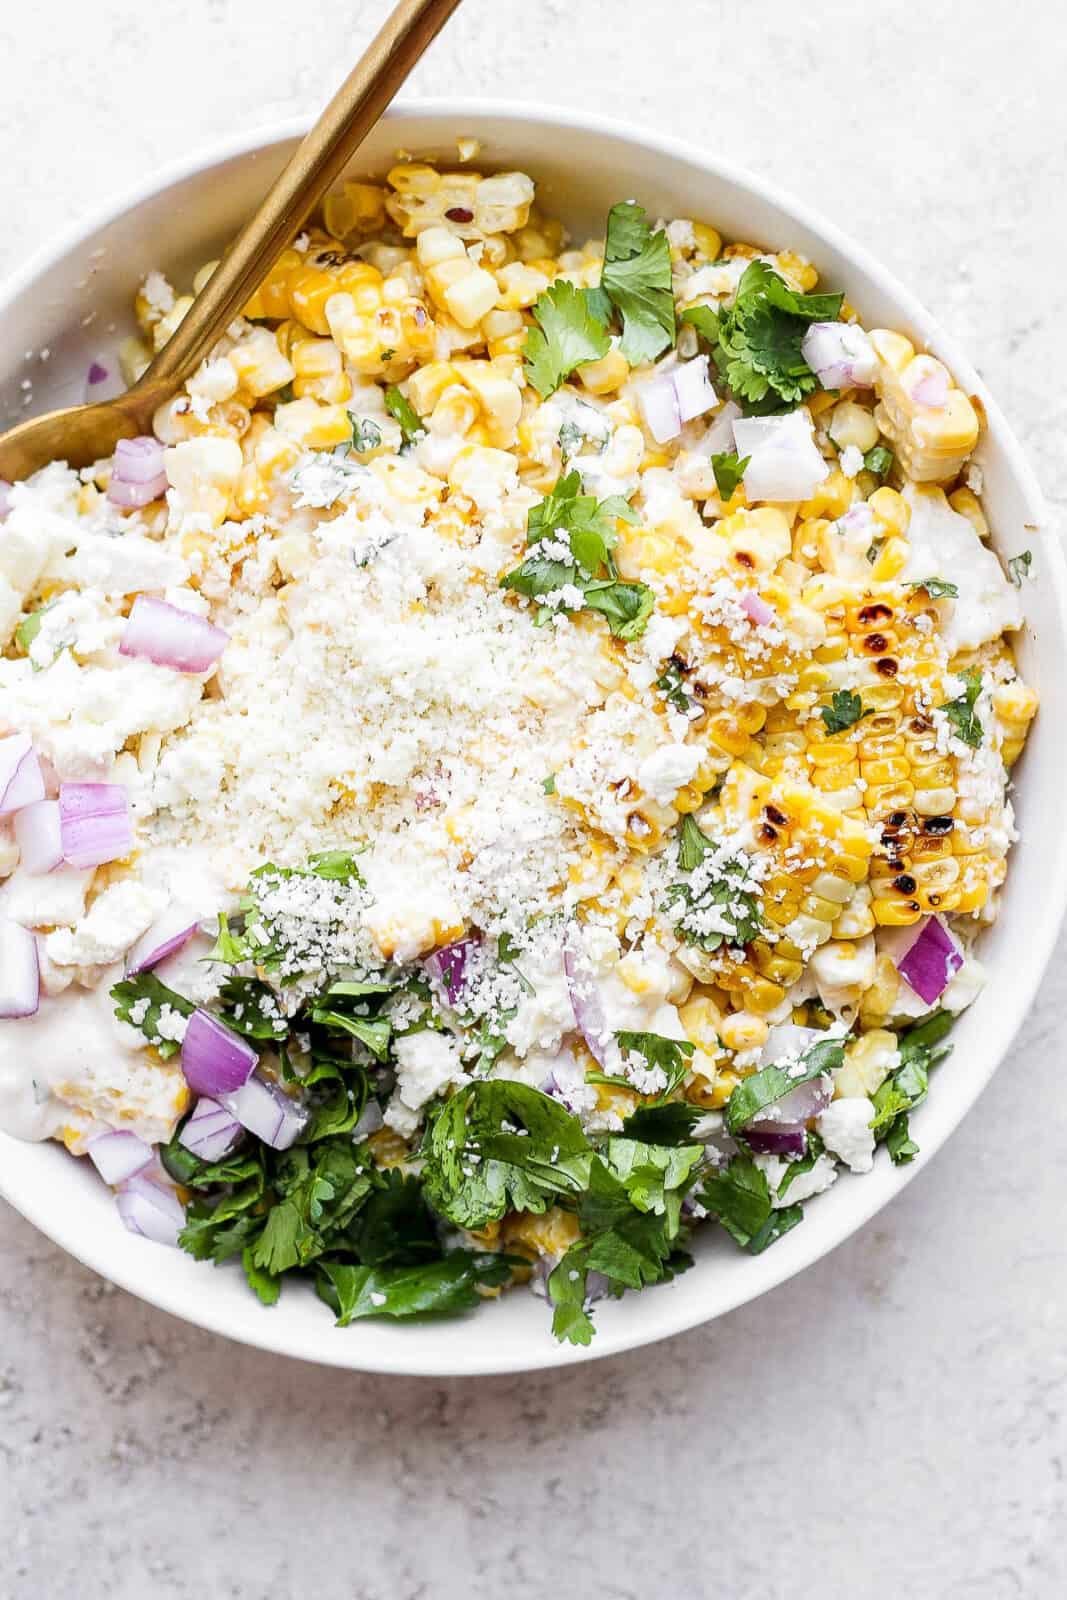 Bowl of Mexican street corn salad.